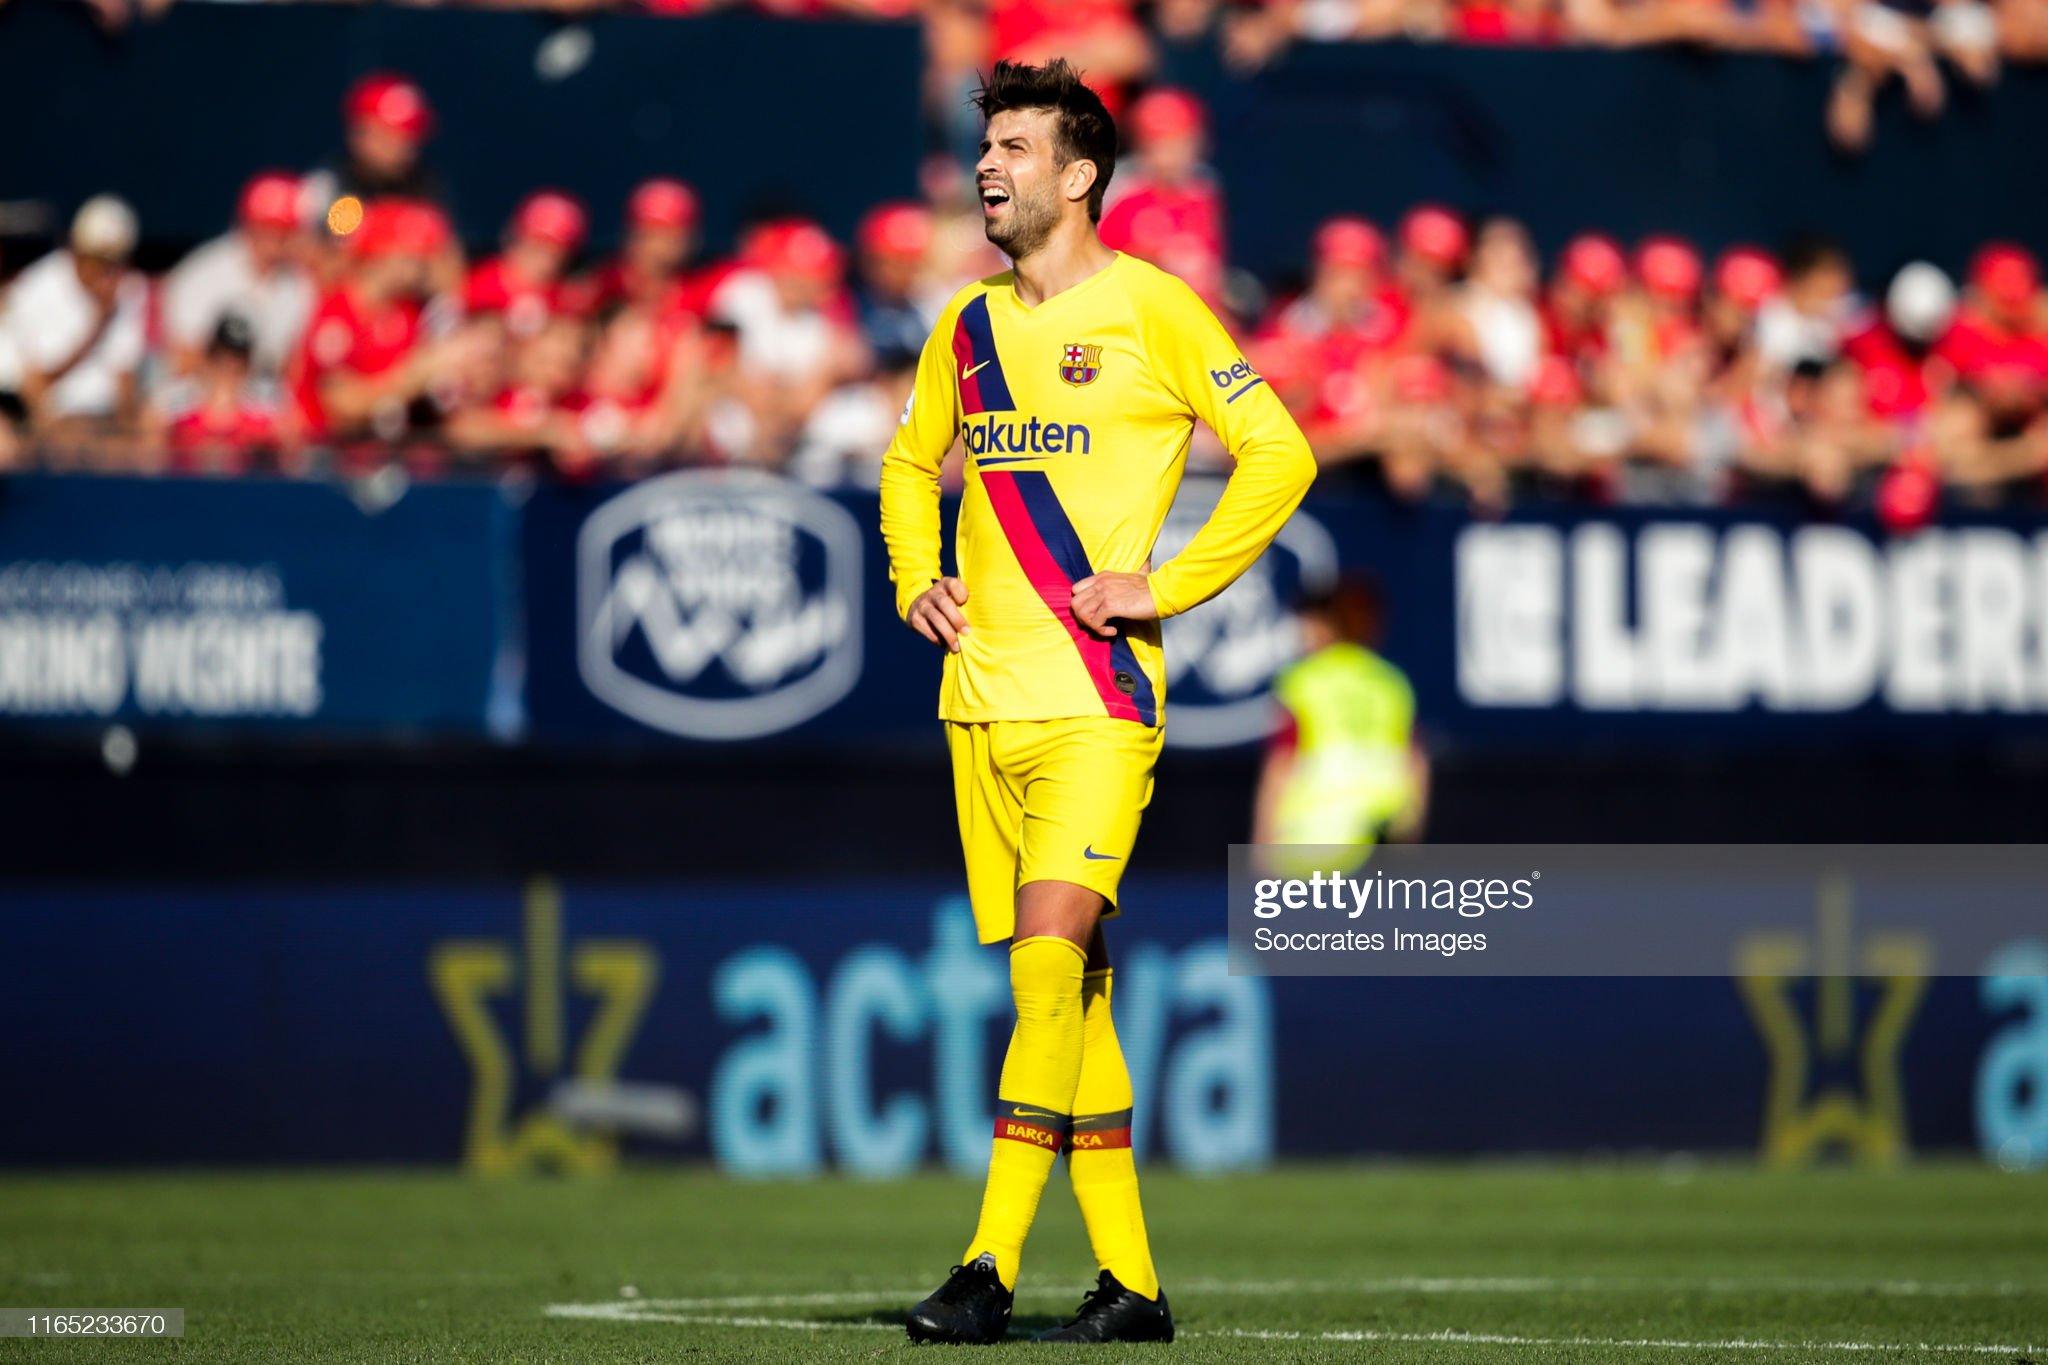 صور مباراة : أوساسونا - برشلونة 2-2 ( 31-08-2019 )  Gerard-pique-of-fc-barcelona-during-the-la-liga-santander-match-v-picture-id1165233670?s=2048x2048